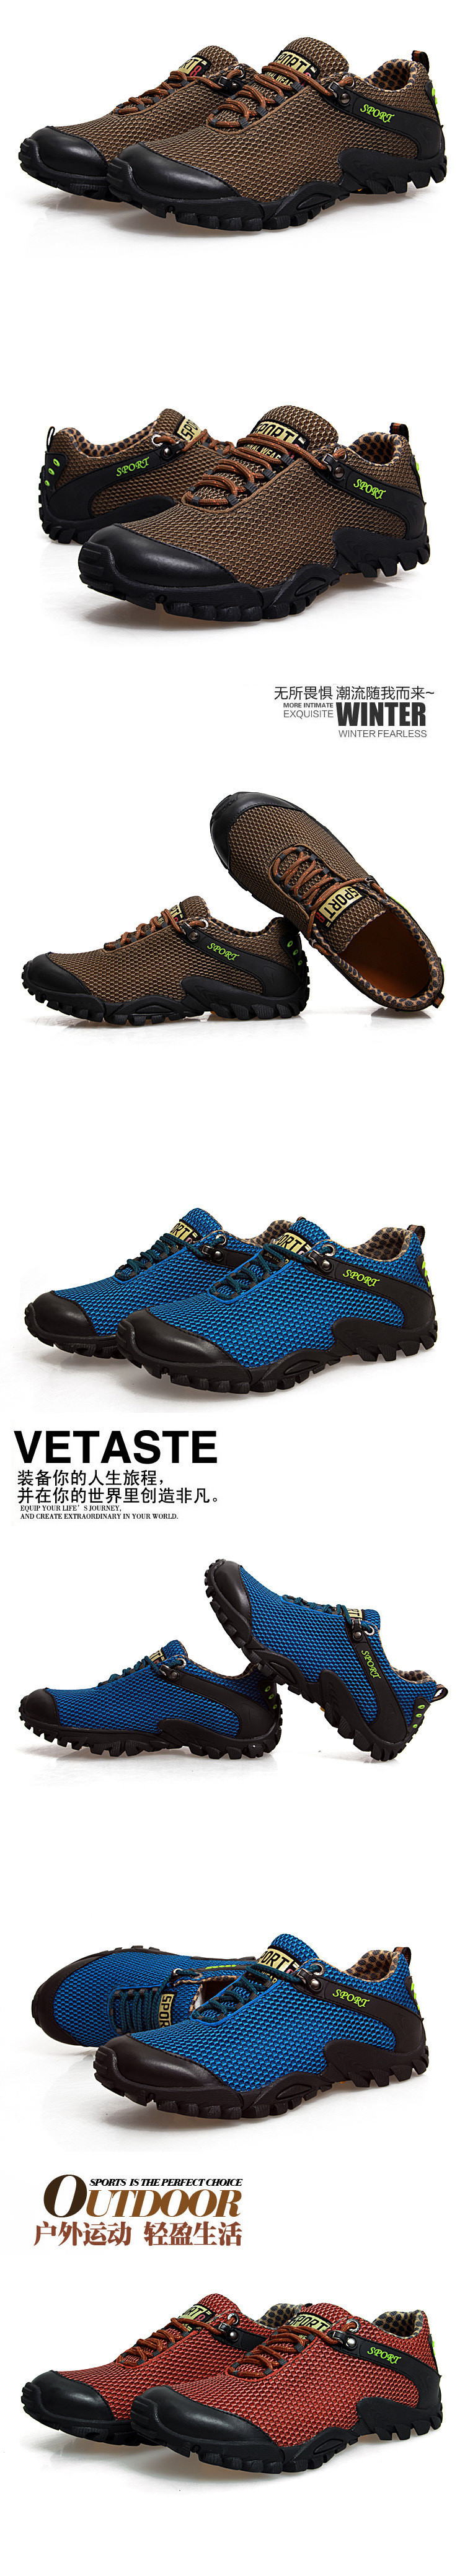 Мужские ботинки eur39/44